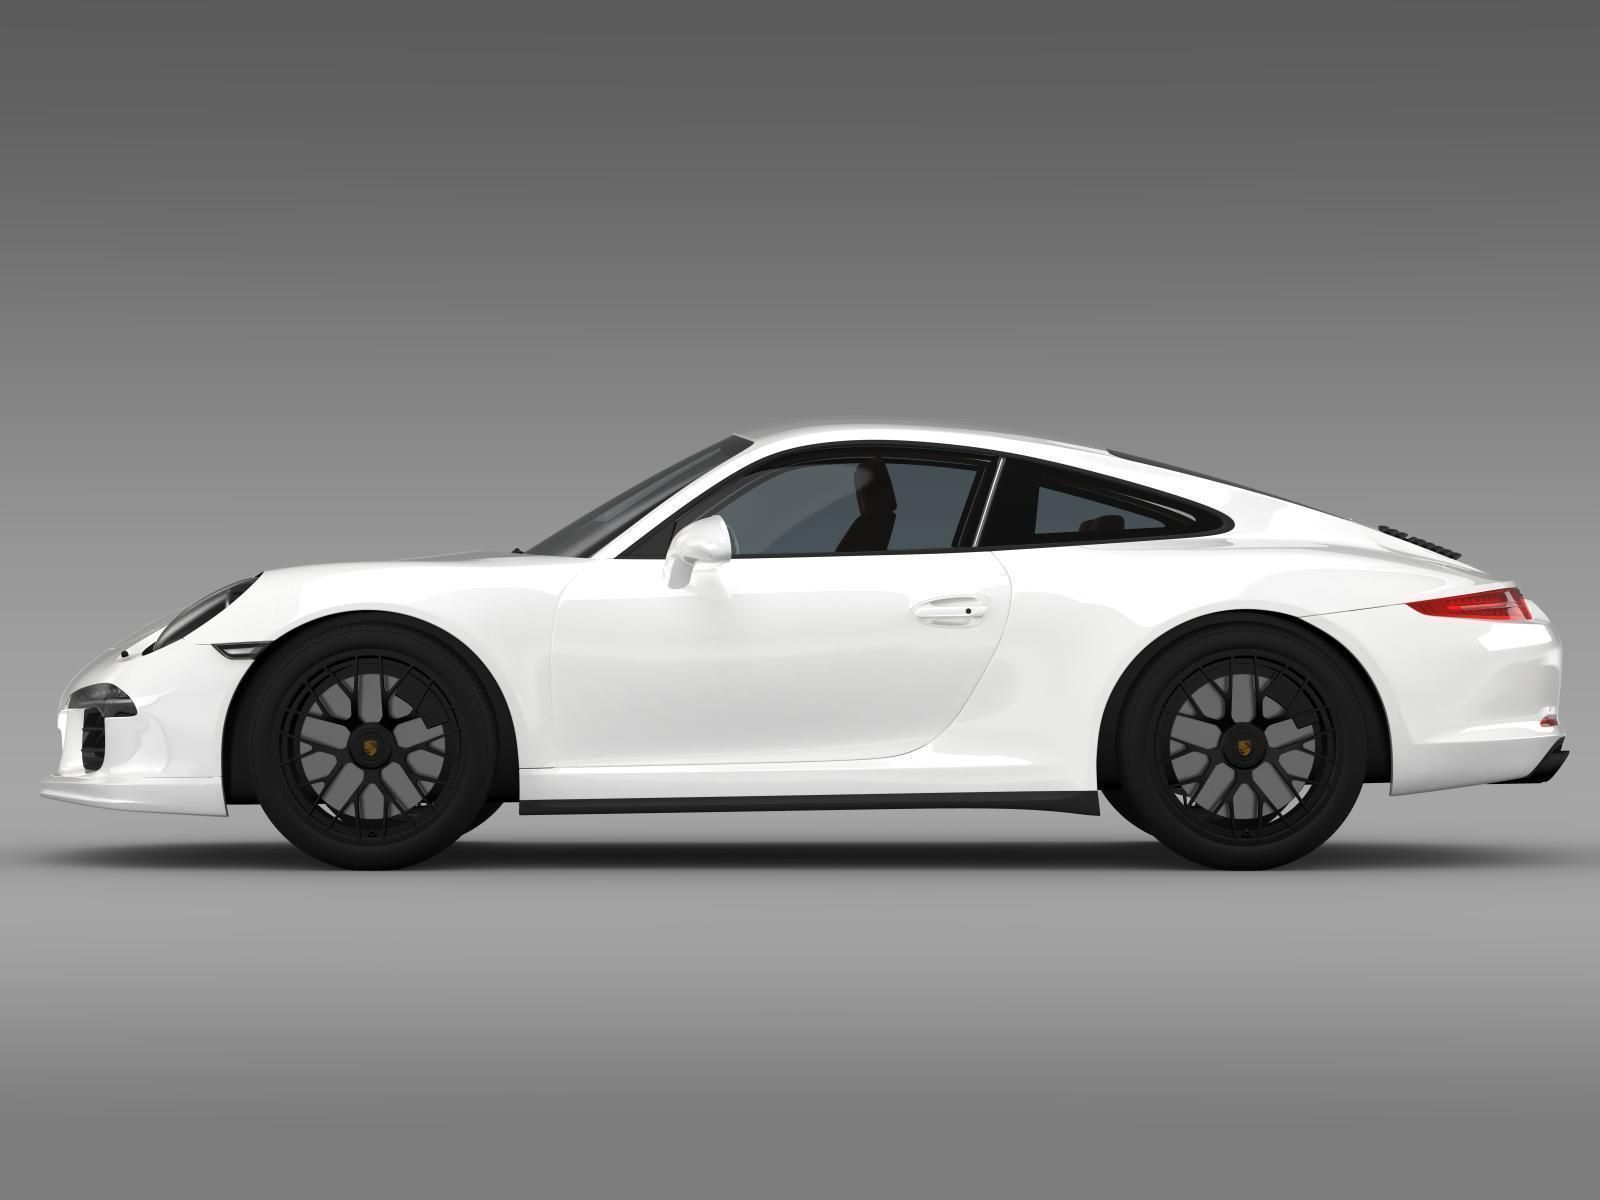 porsche 911 carrera gts coupe 991 2015 3d model max obj 3ds fbx c4d lwo lw - 911 Porsche 2015